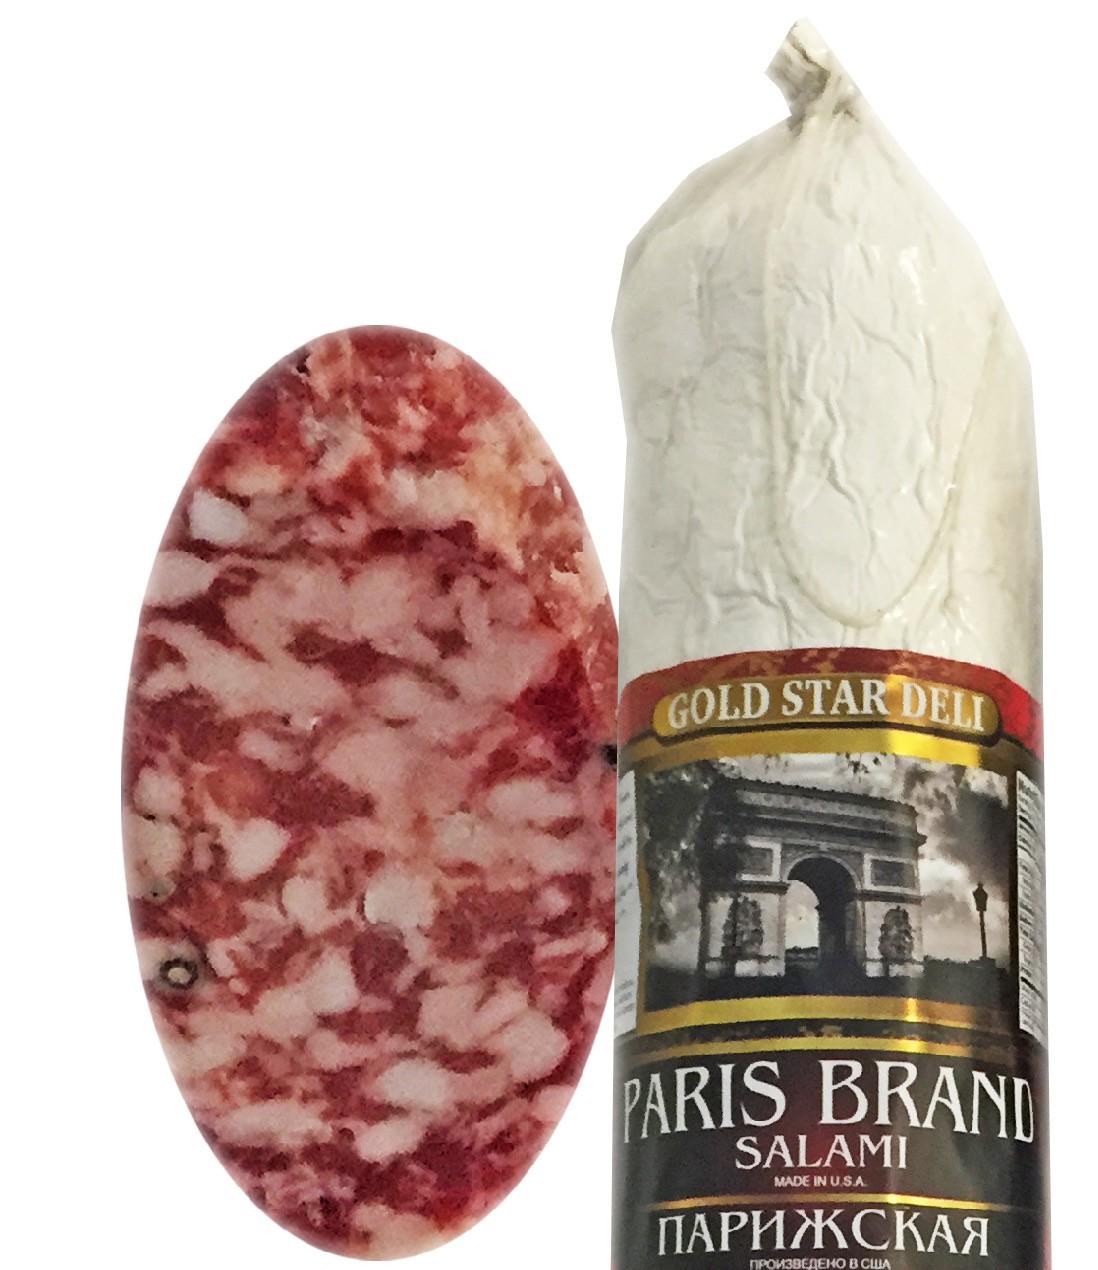 Paris Brand Salami Chunk, 0.9 lb/ 0.4 kg